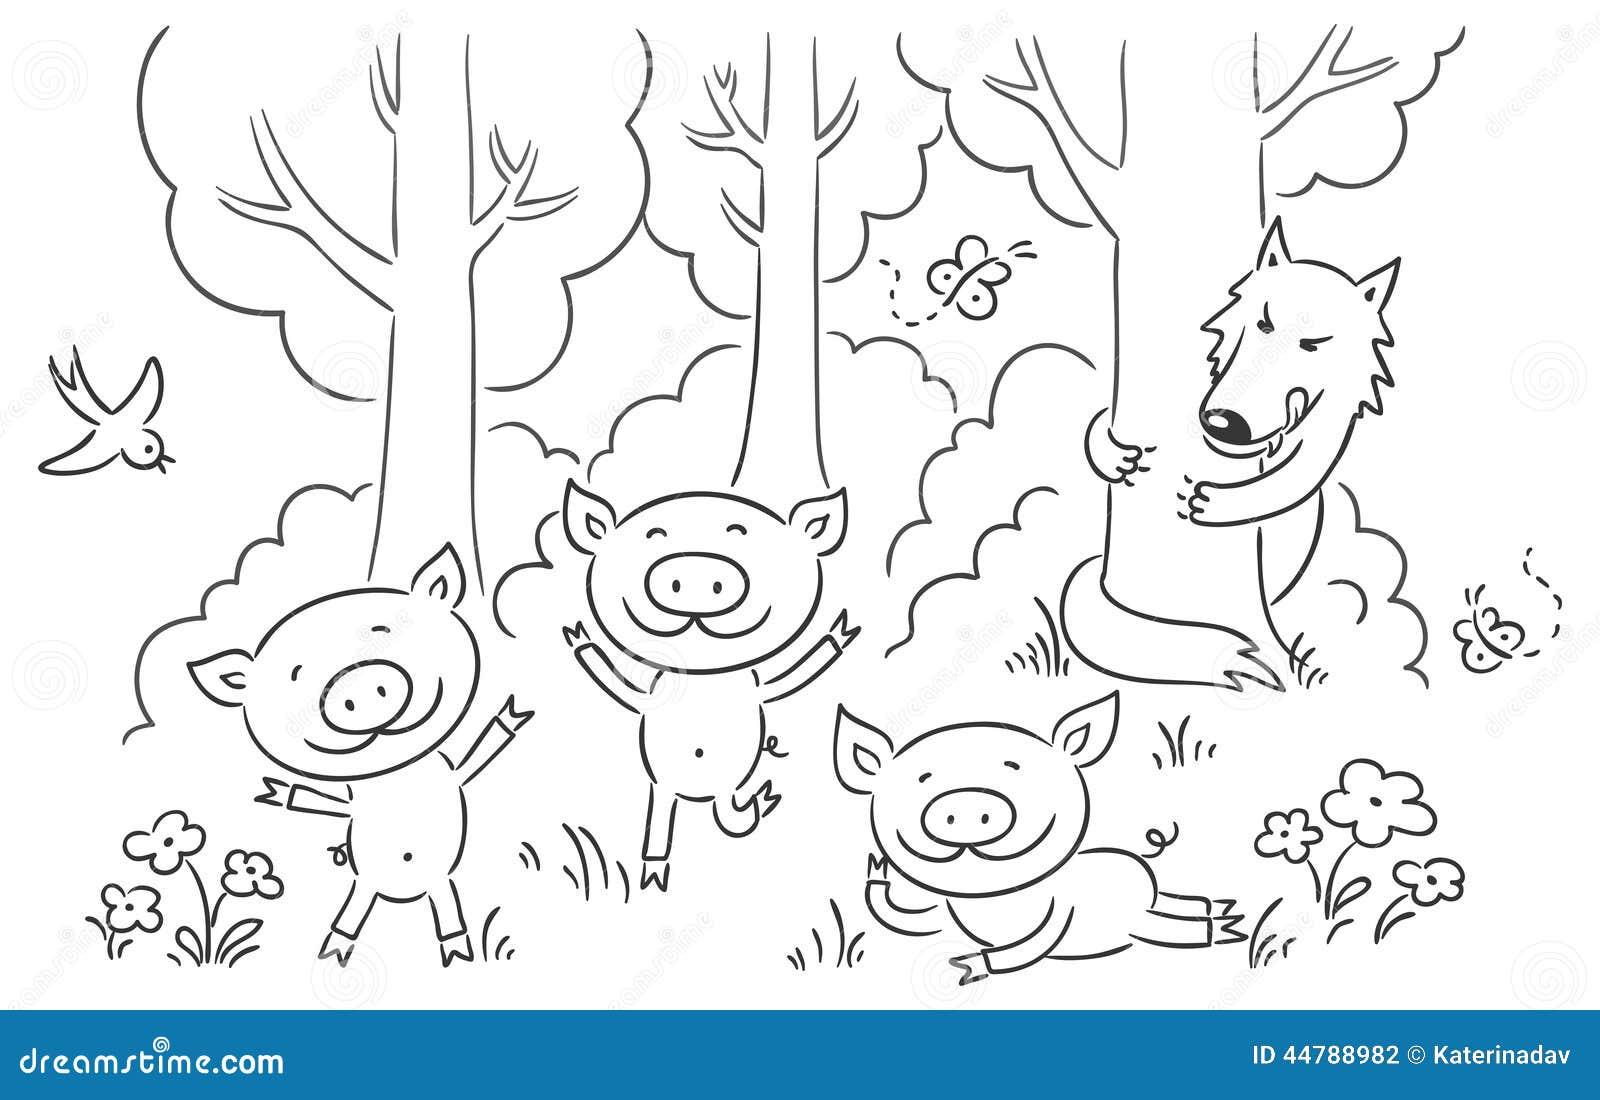 Three Little Pigs Fairy Tale Stock Vector Image 44788982